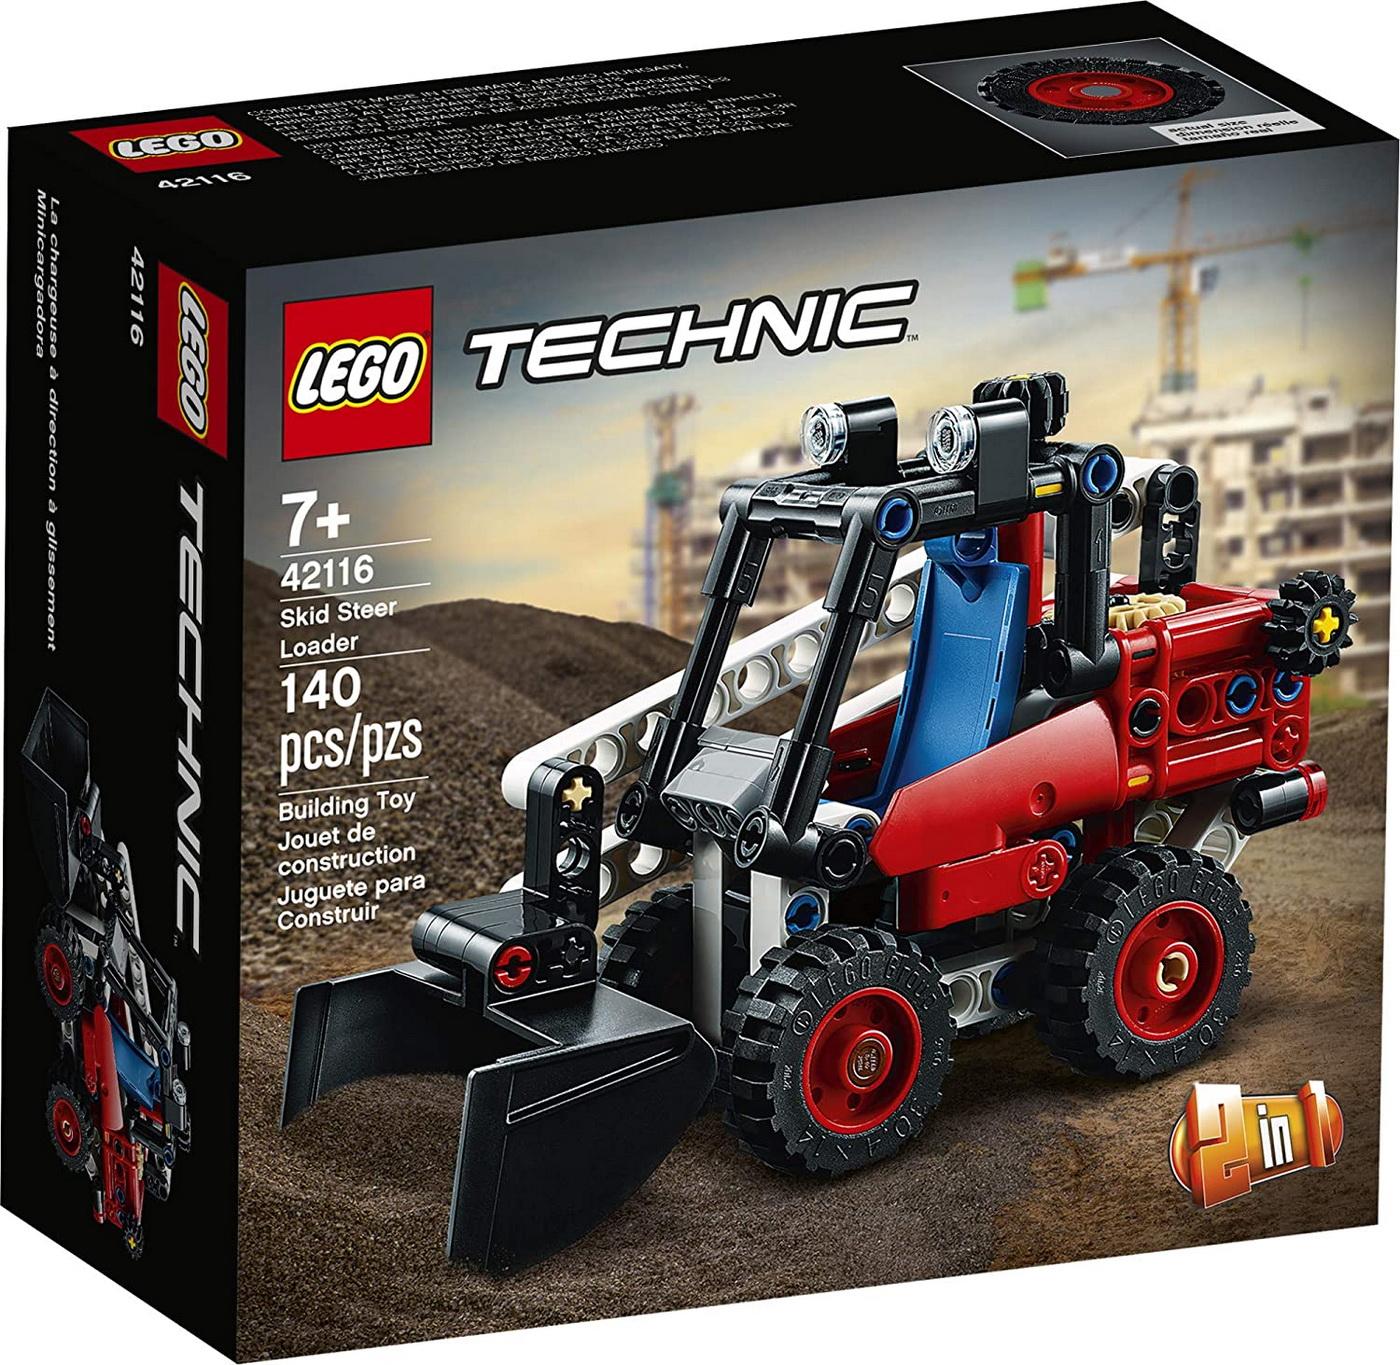 LEGO Technic - Skid Steer Loader (42116)   LEGO - 1